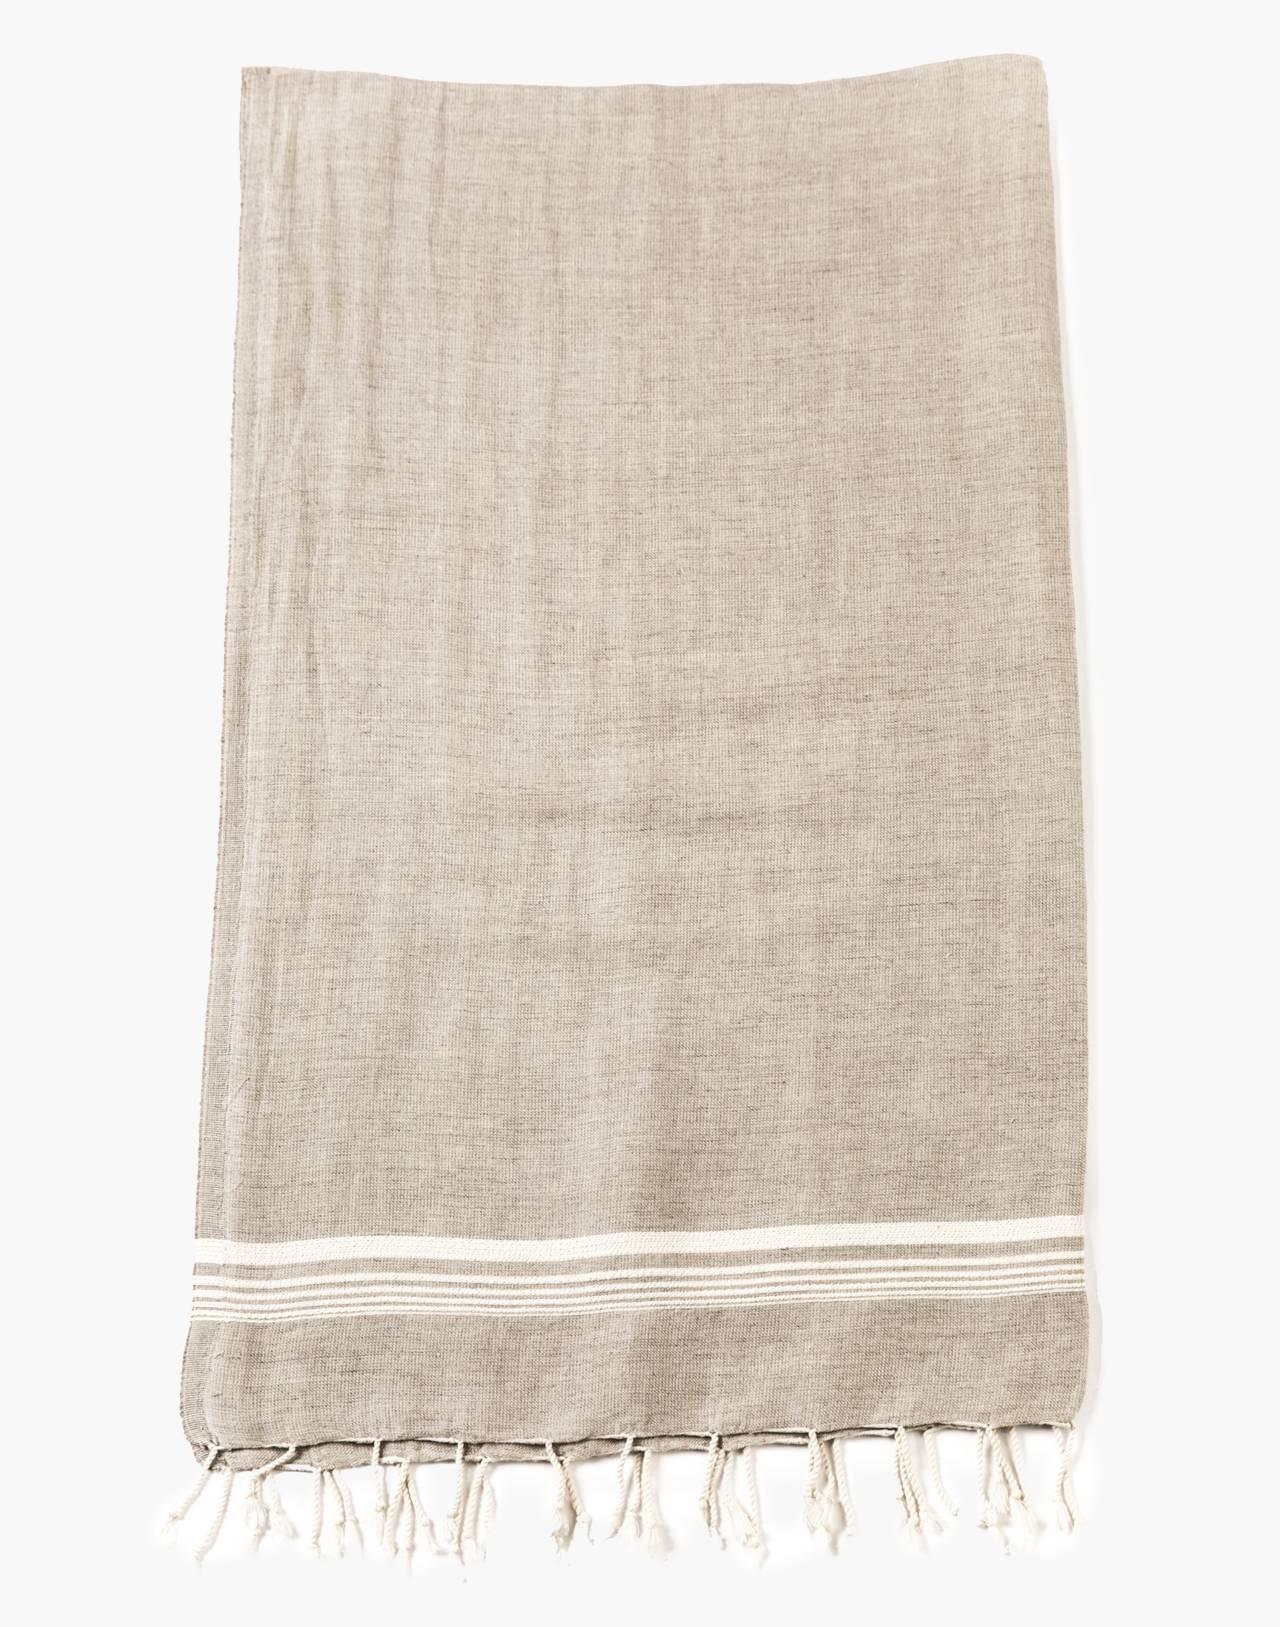 HOUSE No. 23™ Oli Towel in white image 2